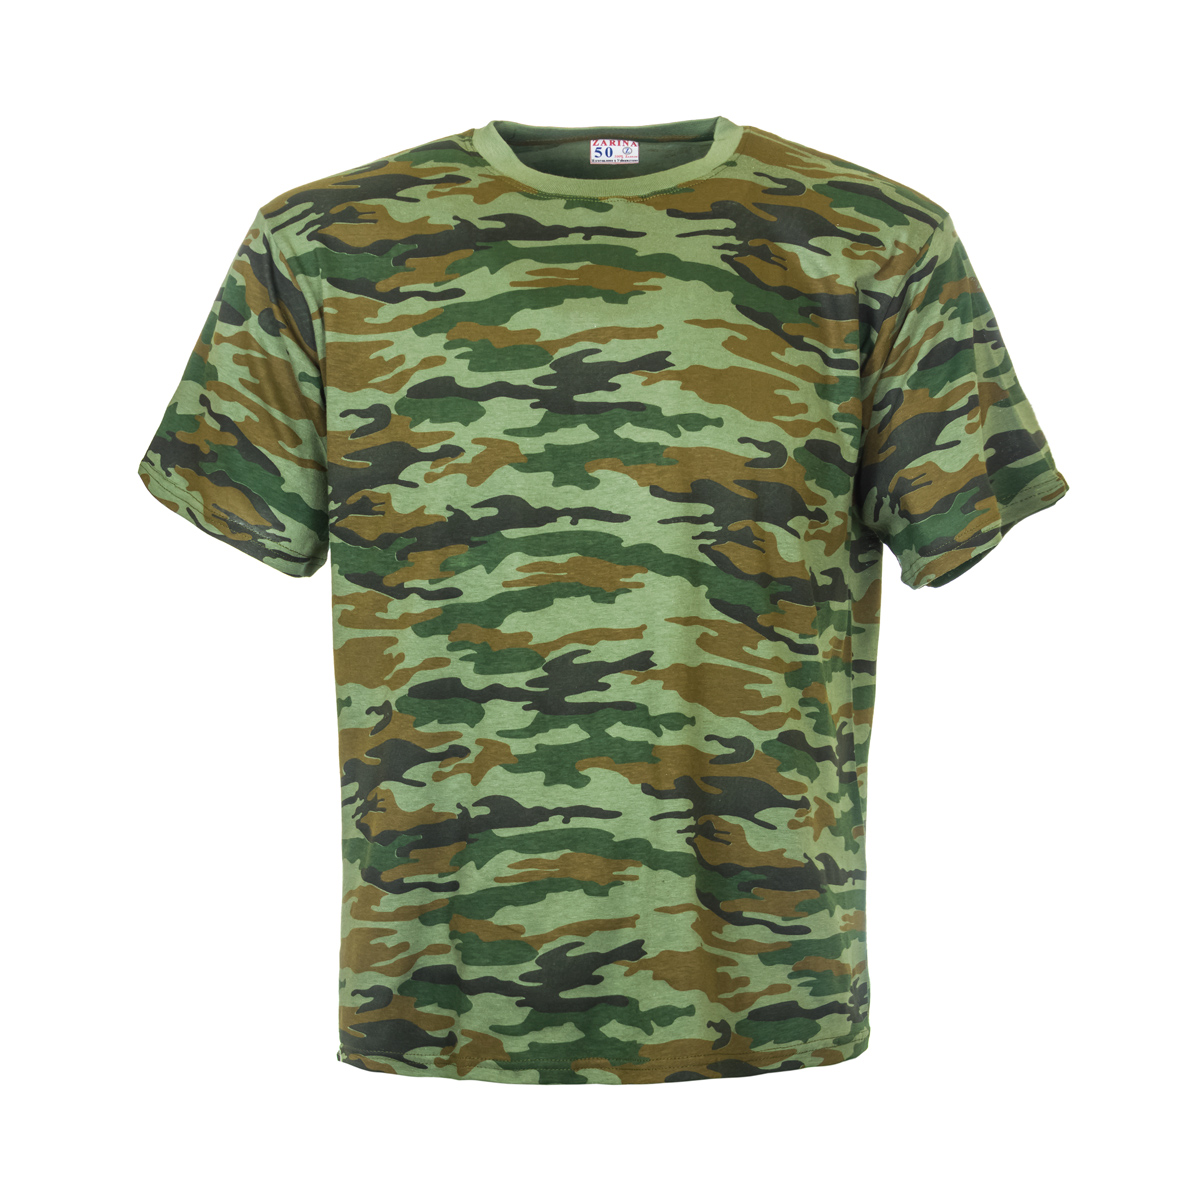 Муж. футболка Камуфляж р. 50Майки и футболки<br>Фактический ОГ:102 см<br>Фактический ОТ:102 см<br>Фактический ОБ:106 см<br>Длина по спинке:72 см<br>Рост:176-182 см<br><br>Тип: Муж. футболка<br>Размер: 50<br>Материал: Кулирка